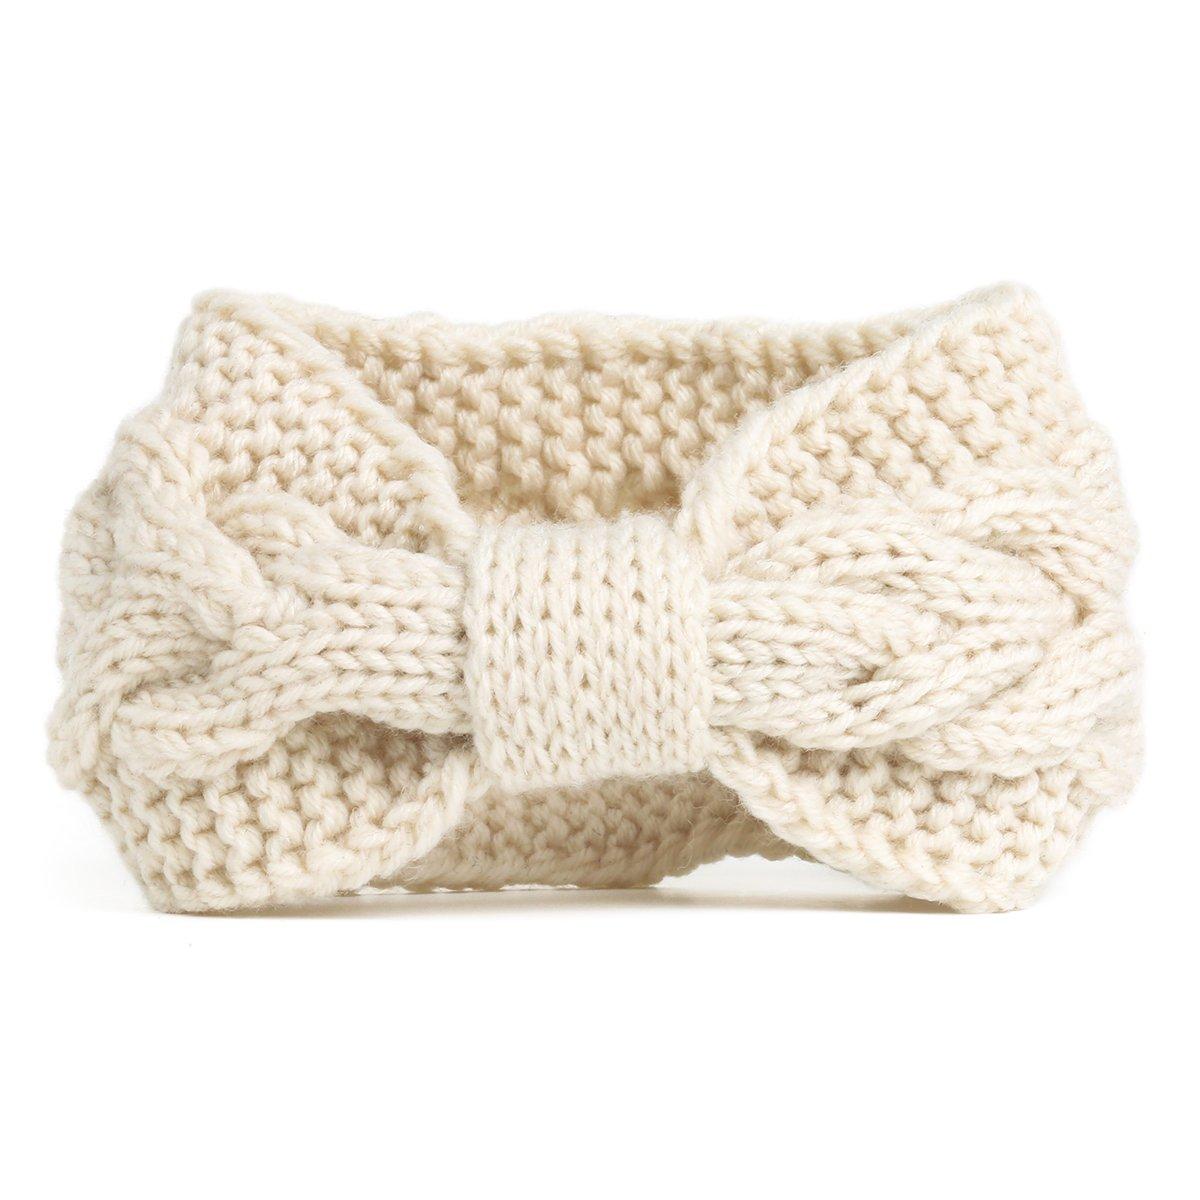 Nishaer Womens Wide Chunky Cable Knitted Turban Headband Beige